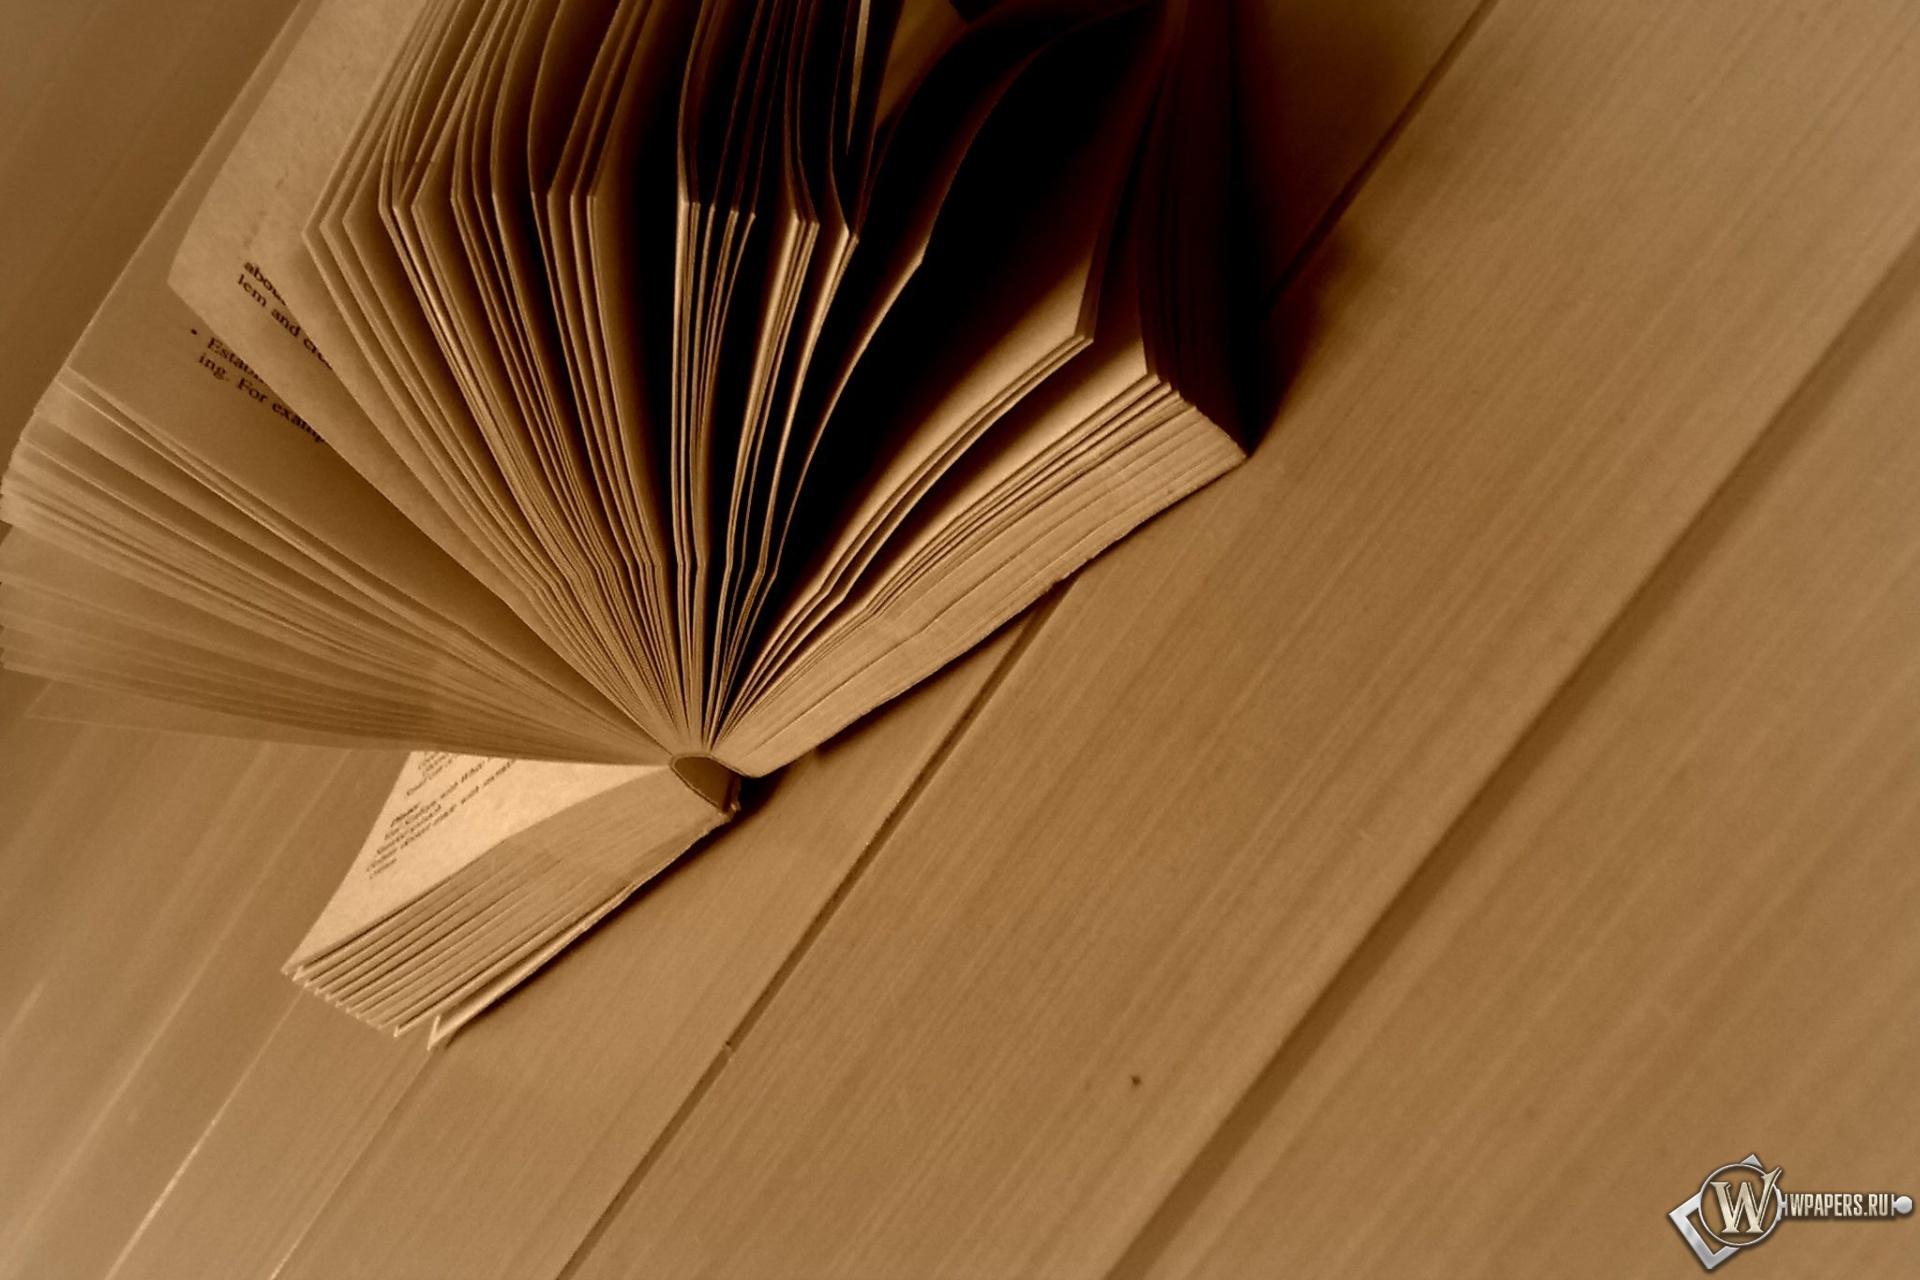 Развёрнутая книга 1920x1280